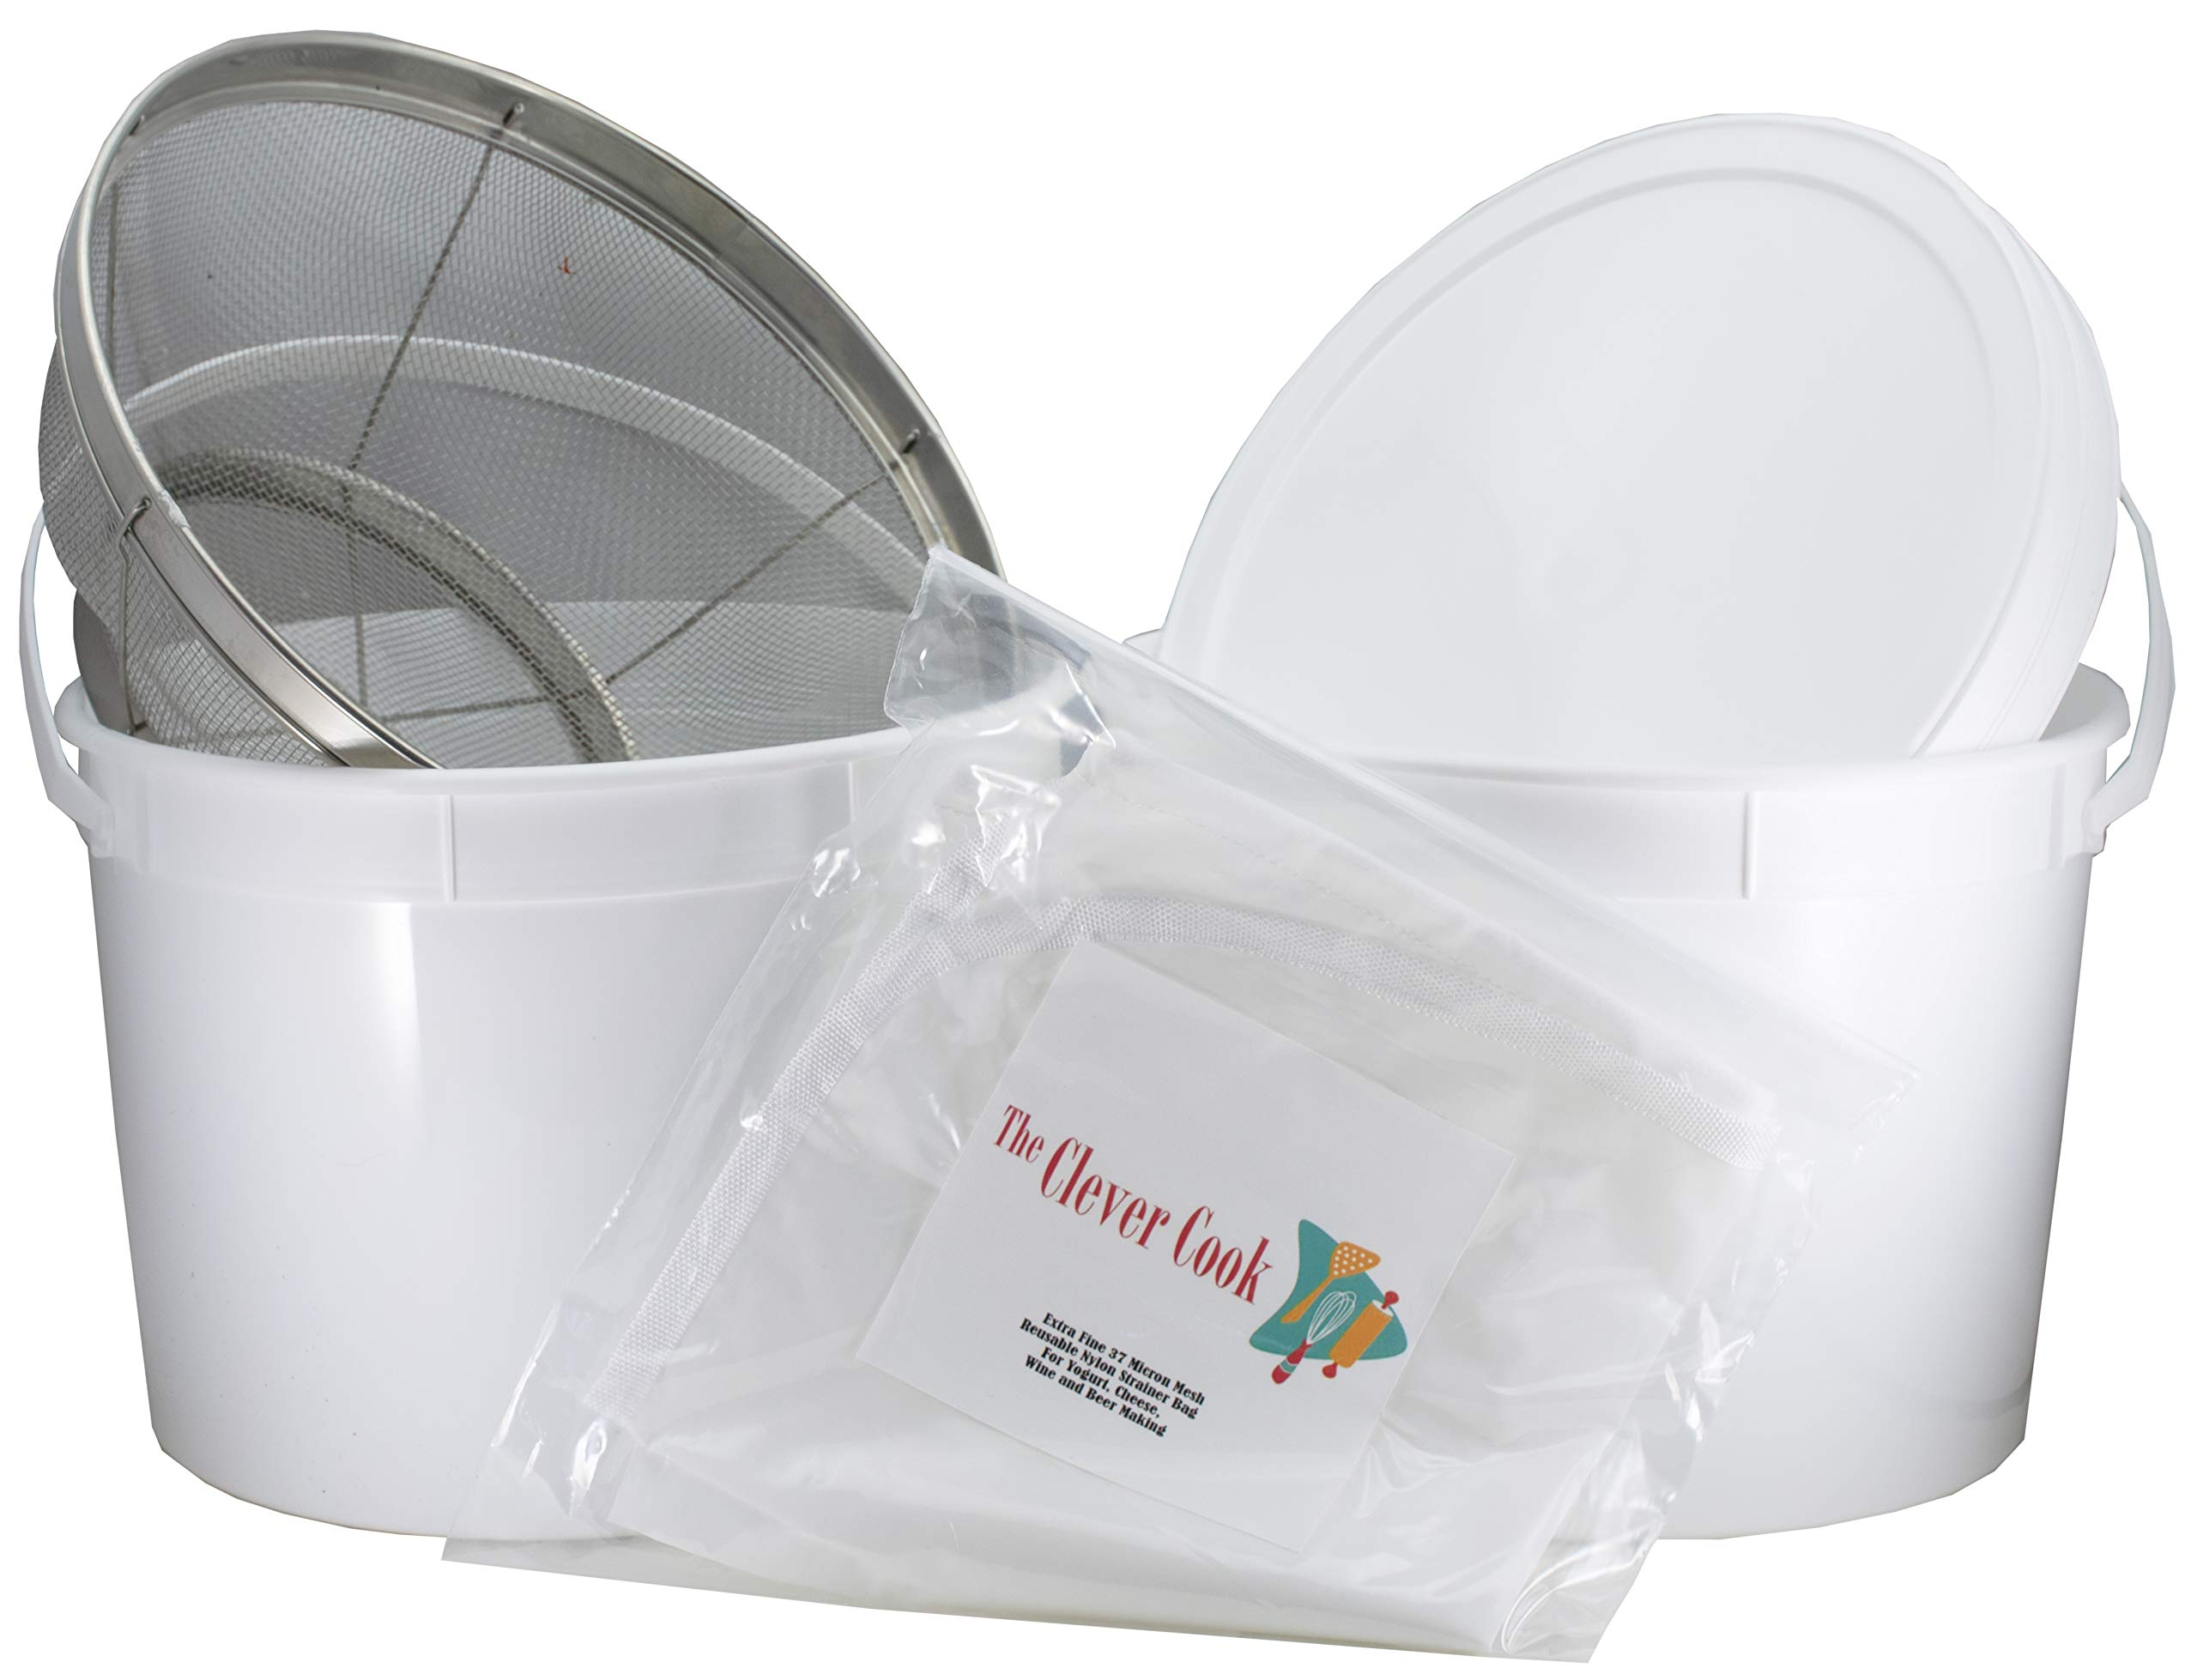 Bulk Greek Yogurt Maker for Instant Pot DUO-60